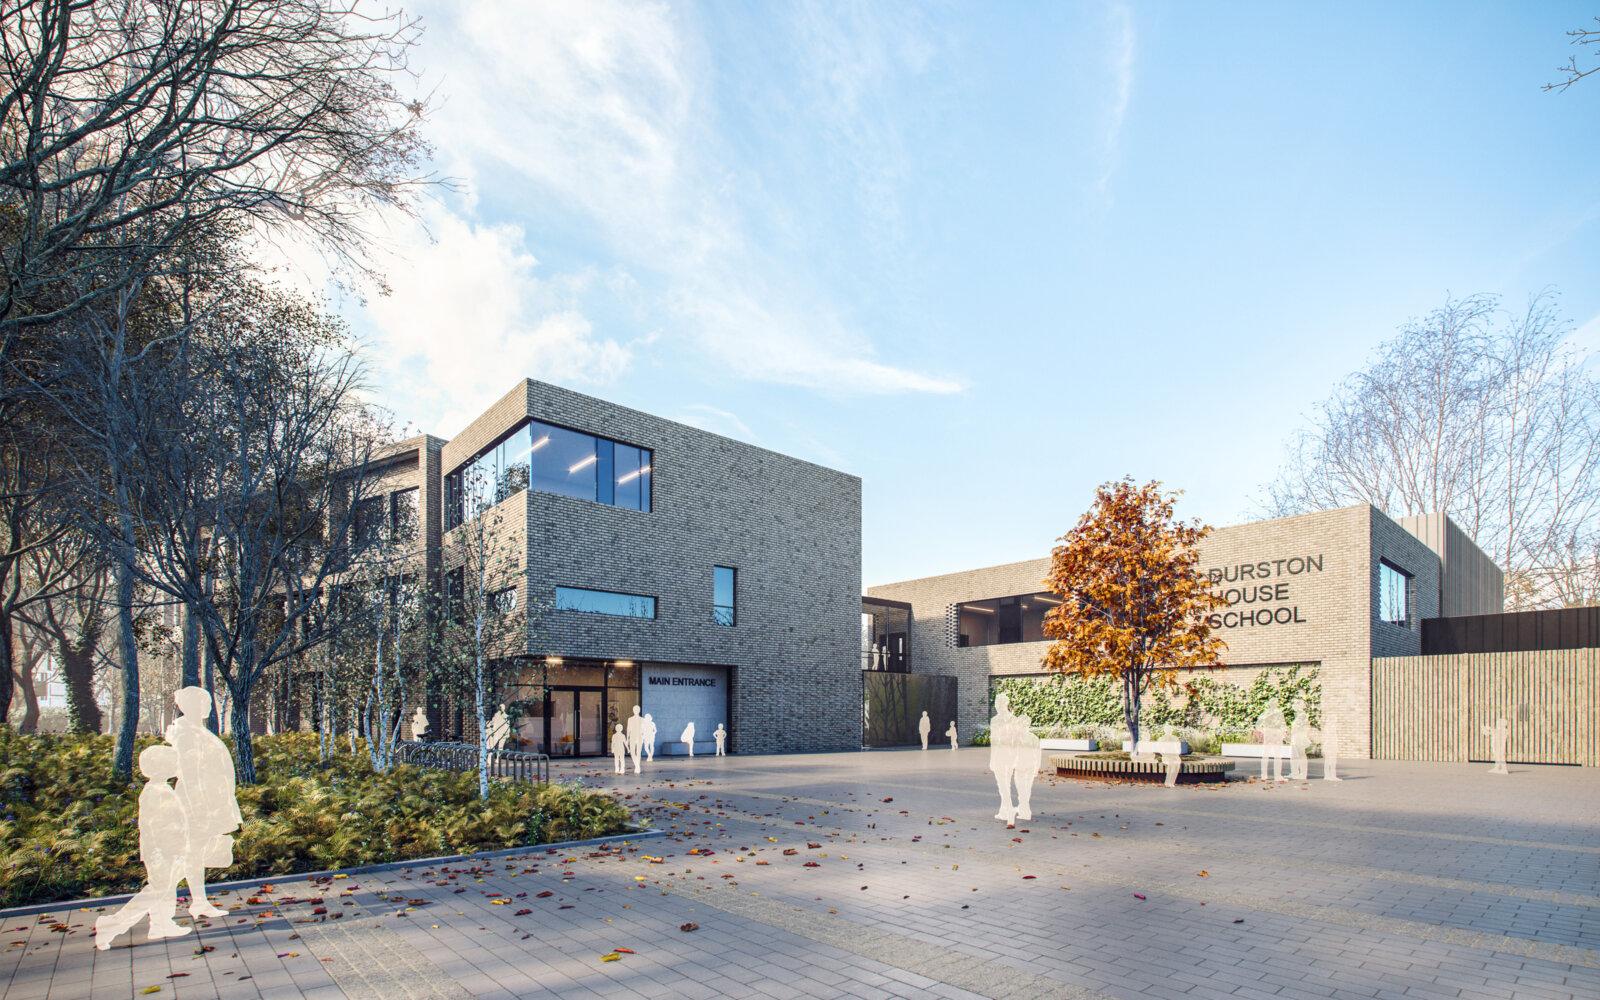 Durston House School entrance CGI